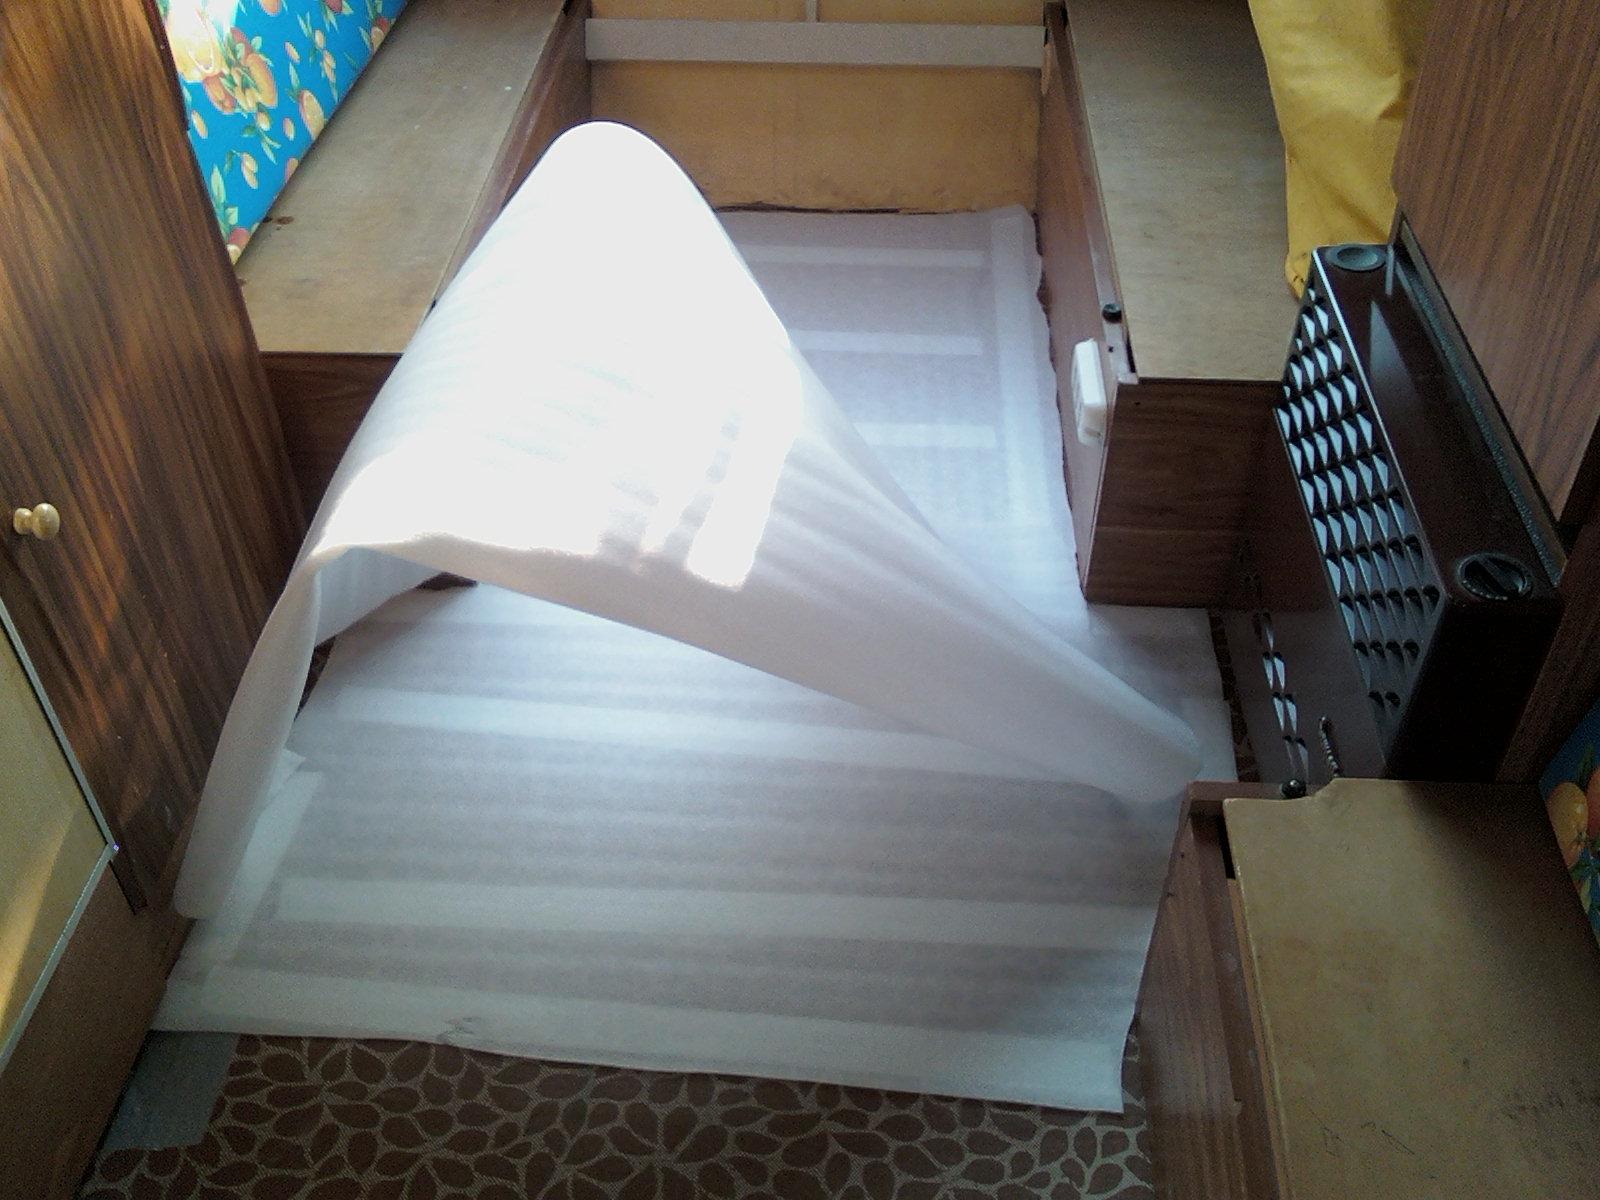 parquets flottants leroy merlin devis entrepreneur tours. Black Bedroom Furniture Sets. Home Design Ideas